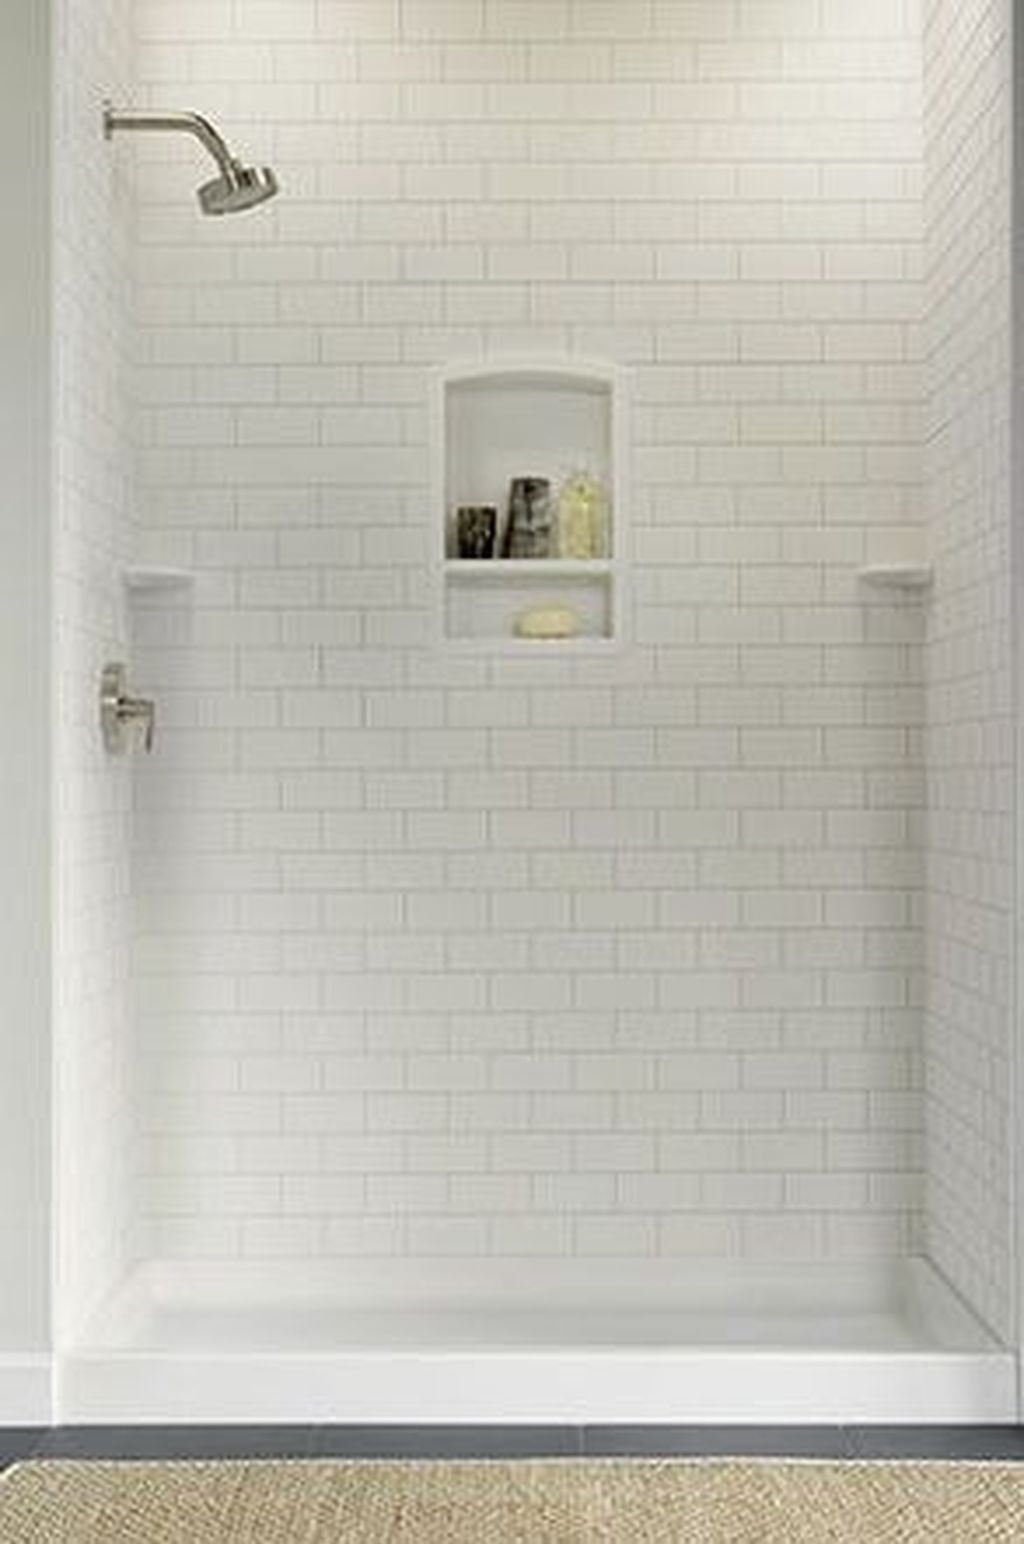 Marvelous Wooden Shower Floor Tiles Designs Ideas For Bathroom Remodel 01